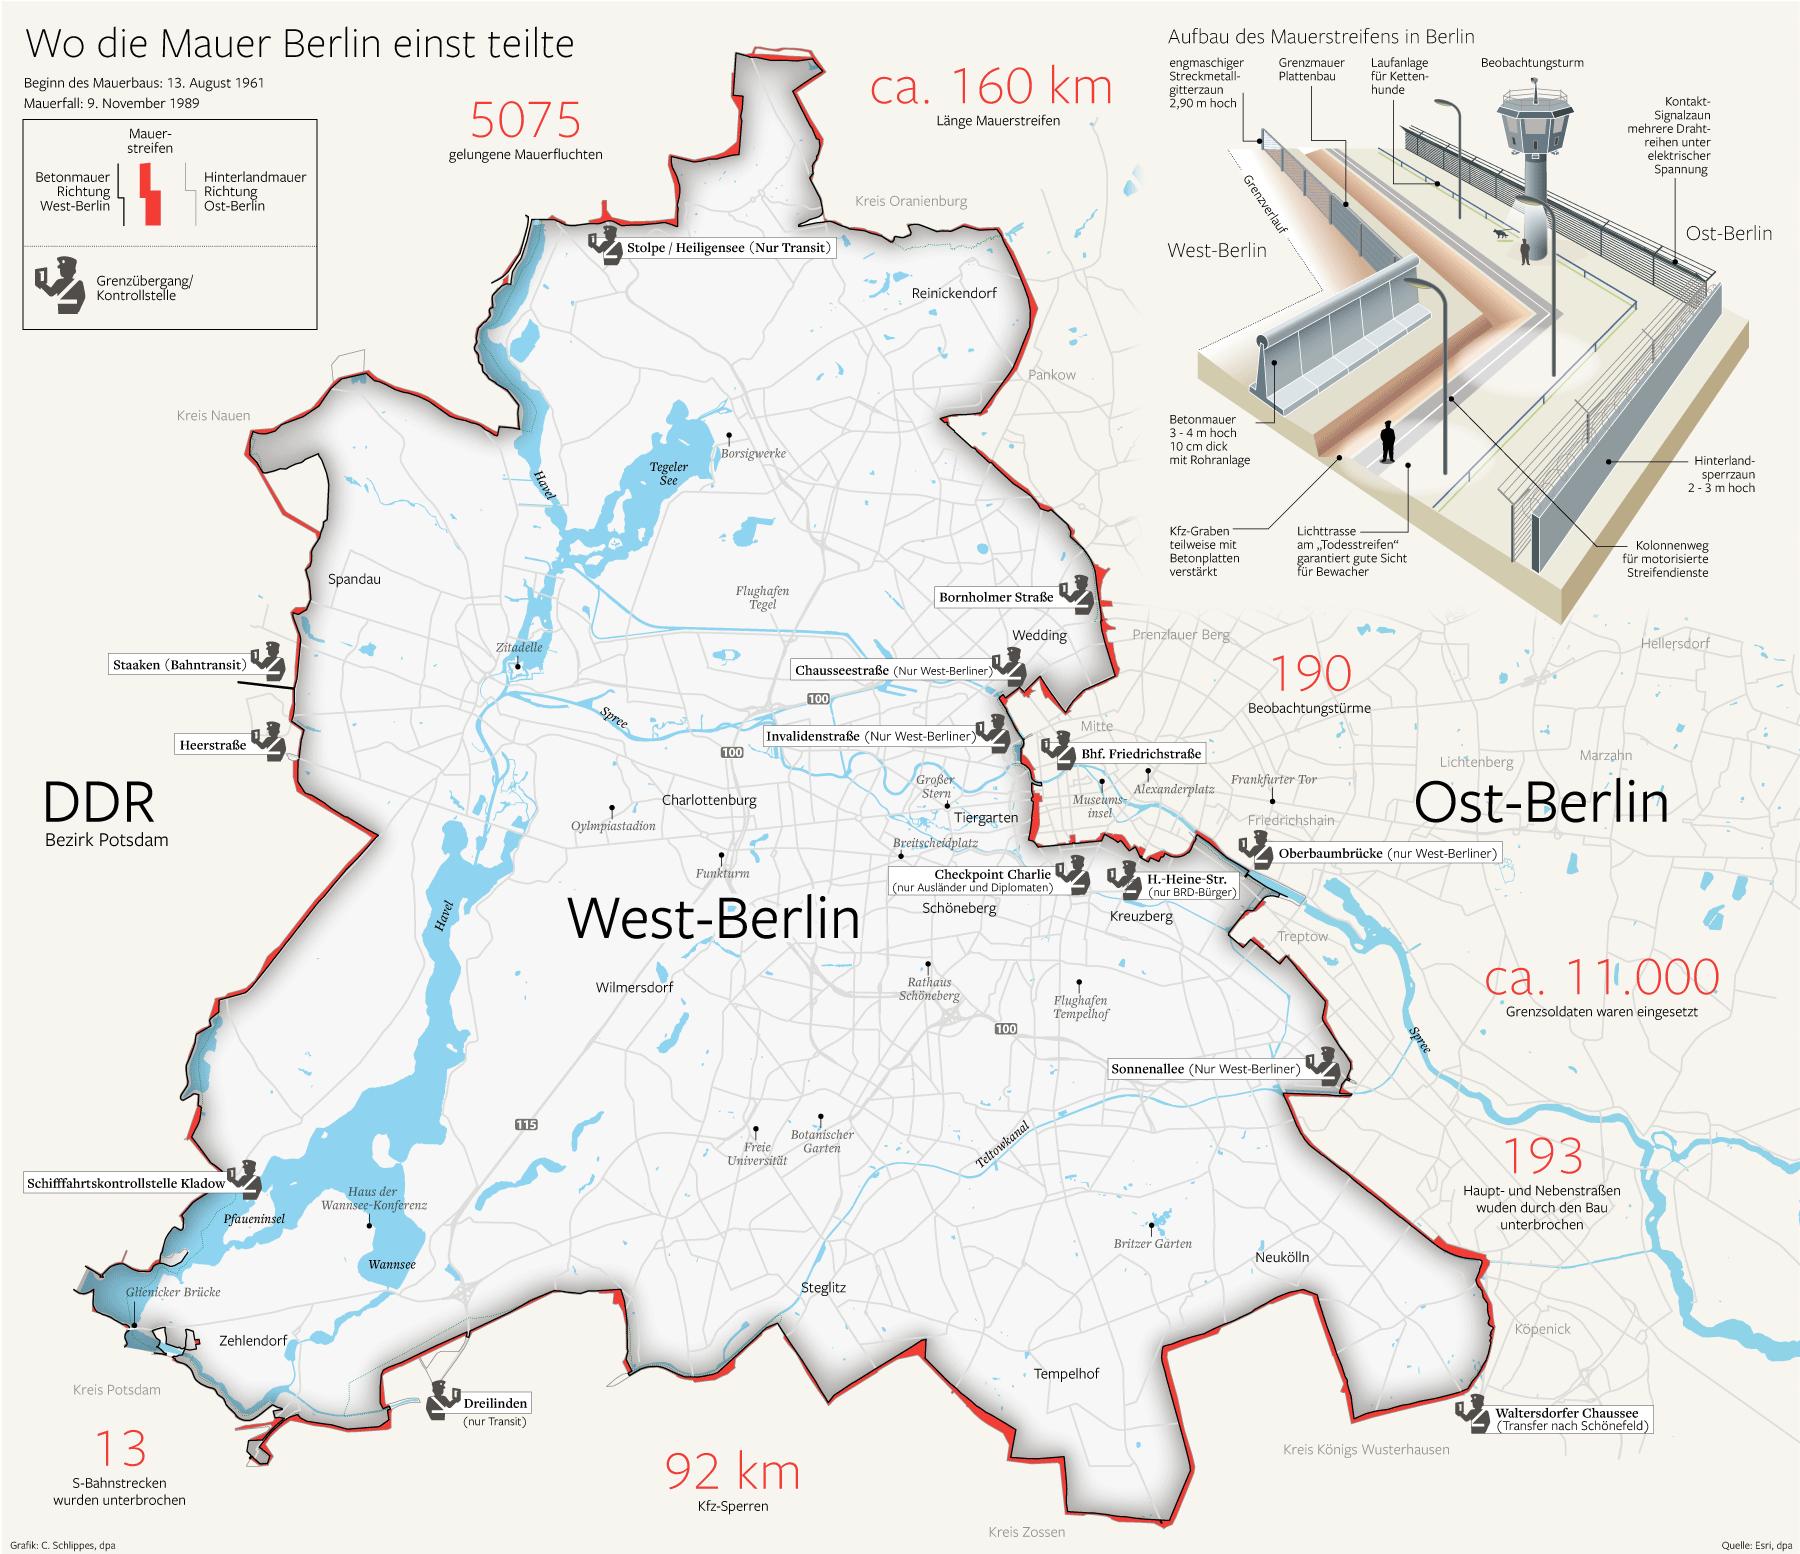 Infografikportfolio Der Berliner Morgenpost Berliner Mauer Berliner Mauer Karte Berlin